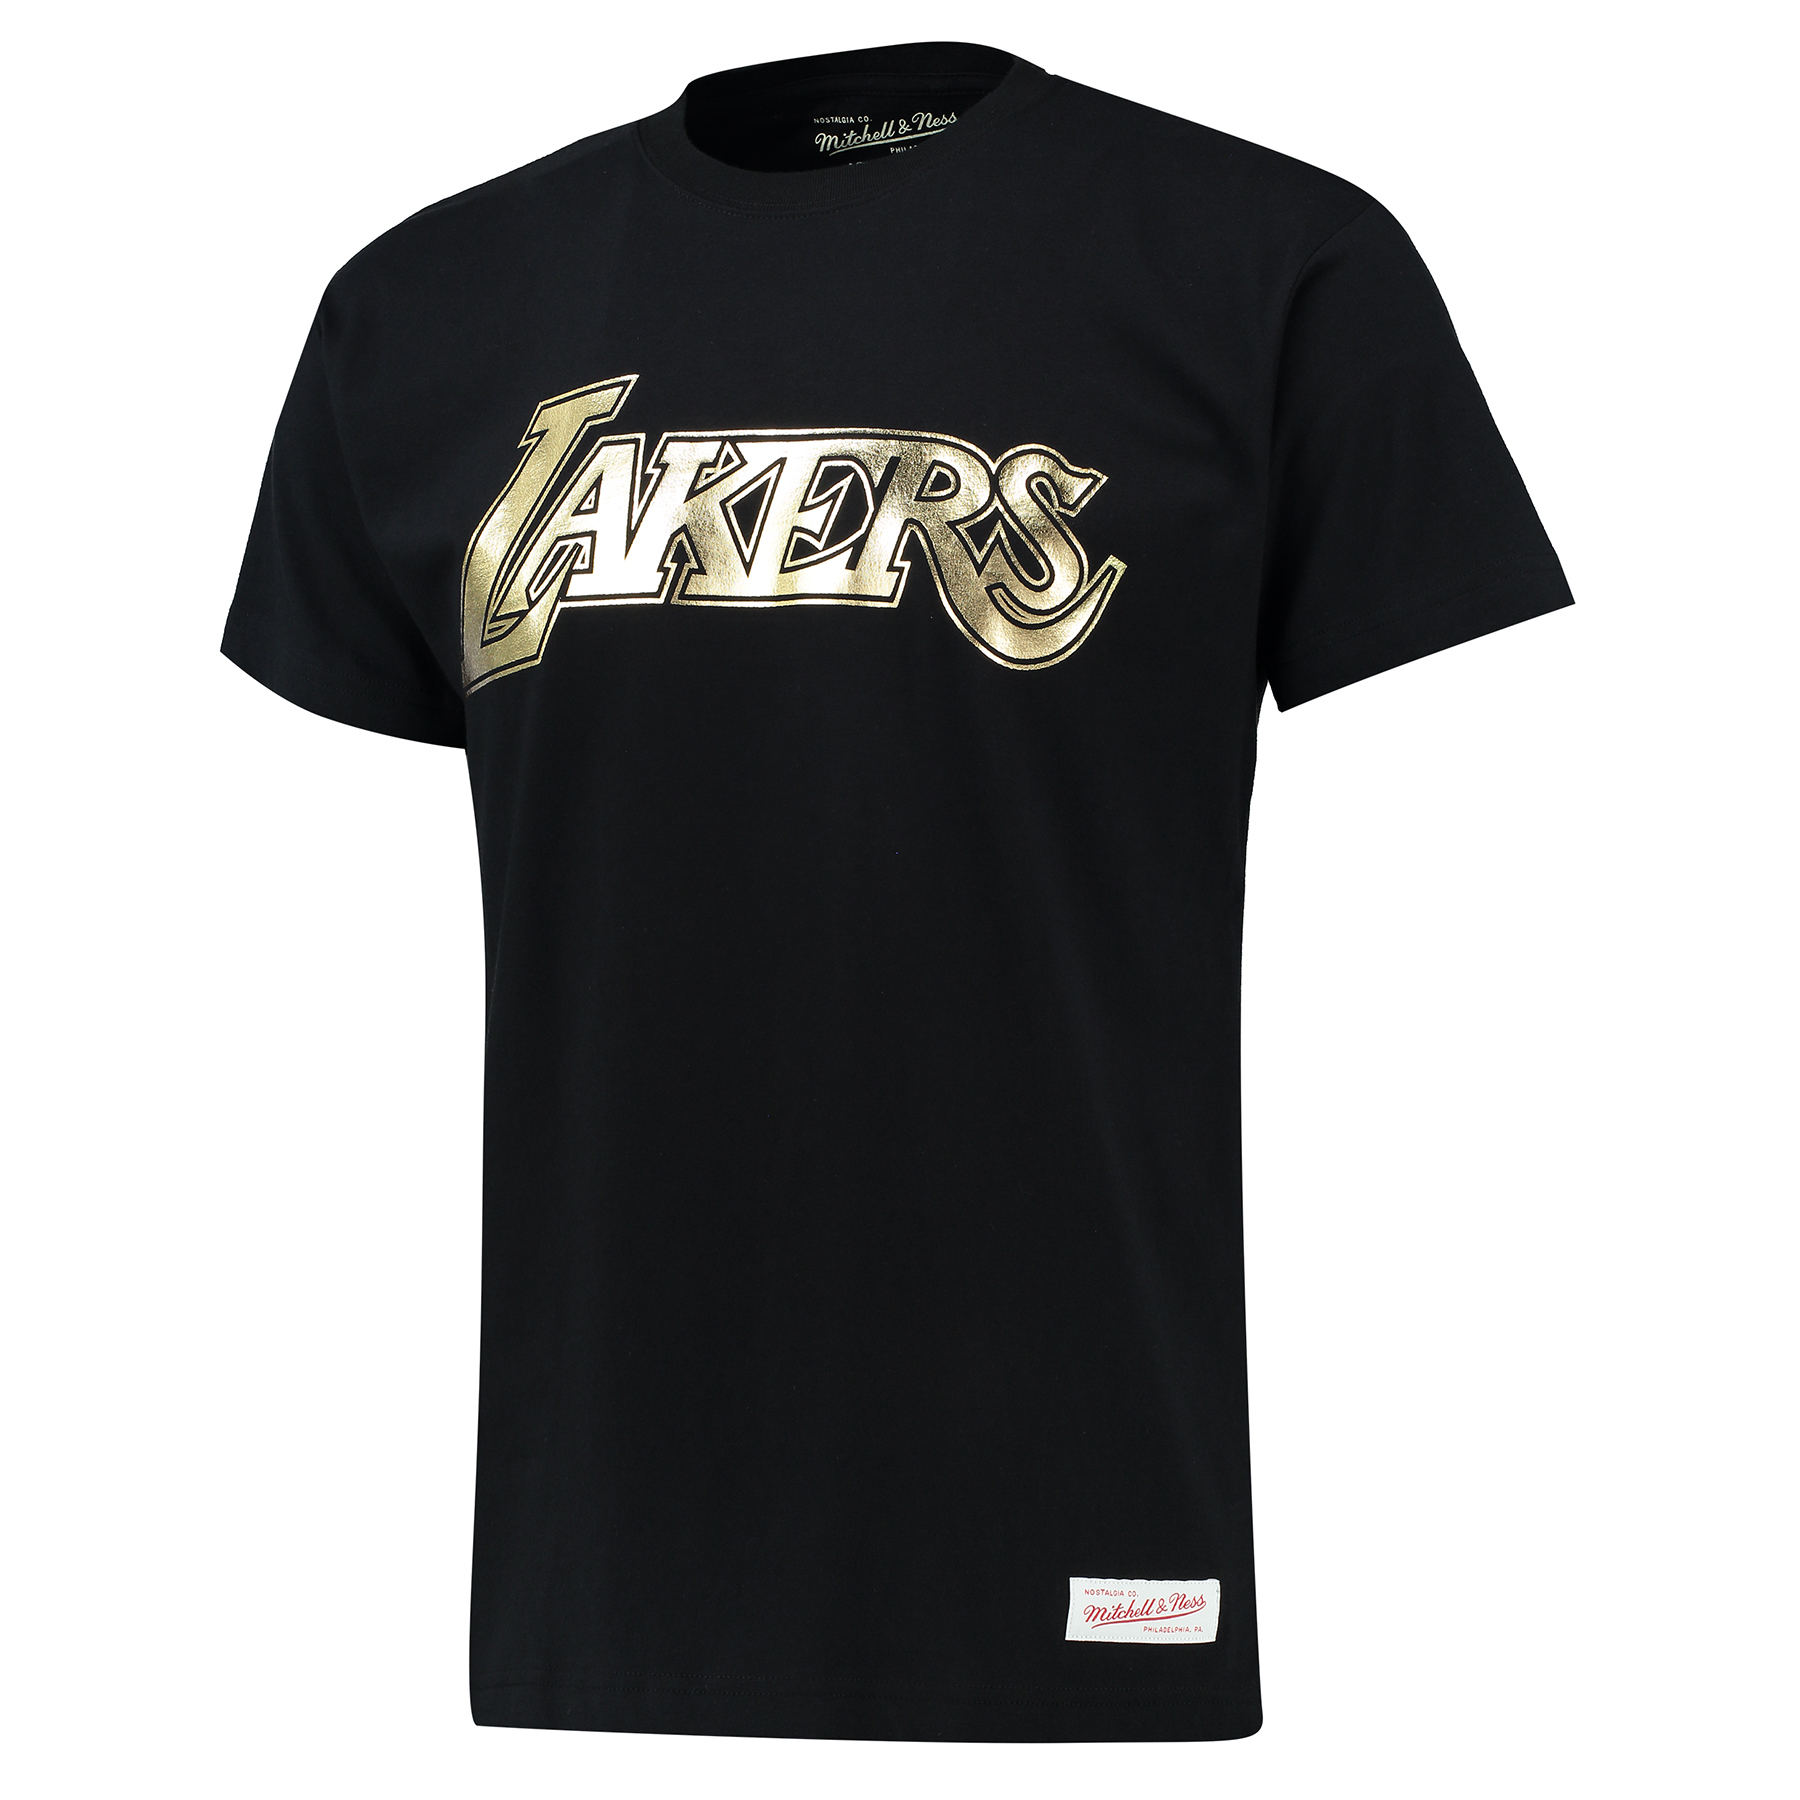 Los Angeles Lakers Kobe Bryant Retirement Gold Foil T-Shirt